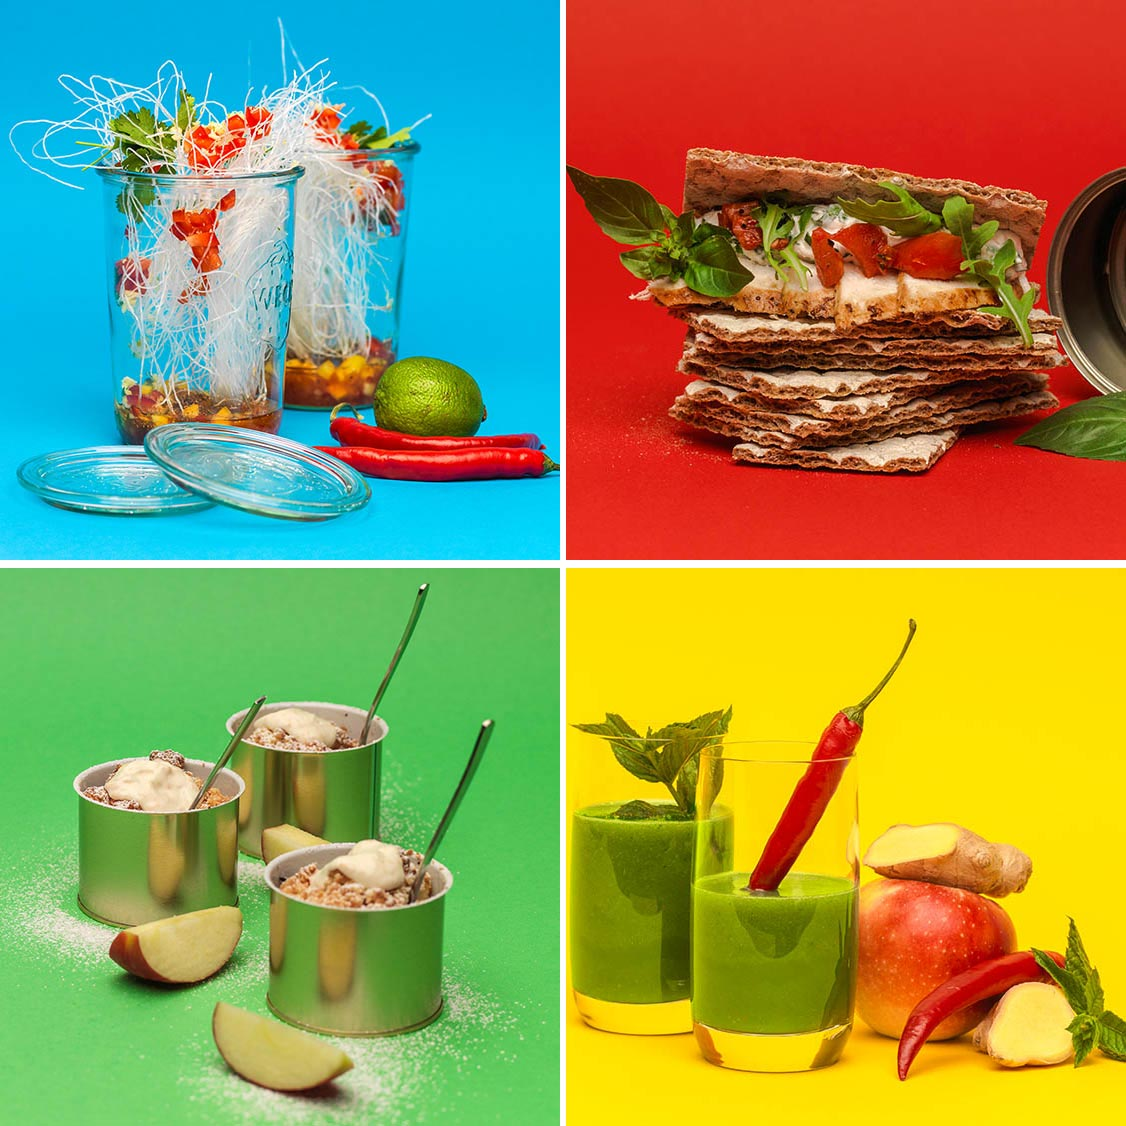 teaser-daily-food